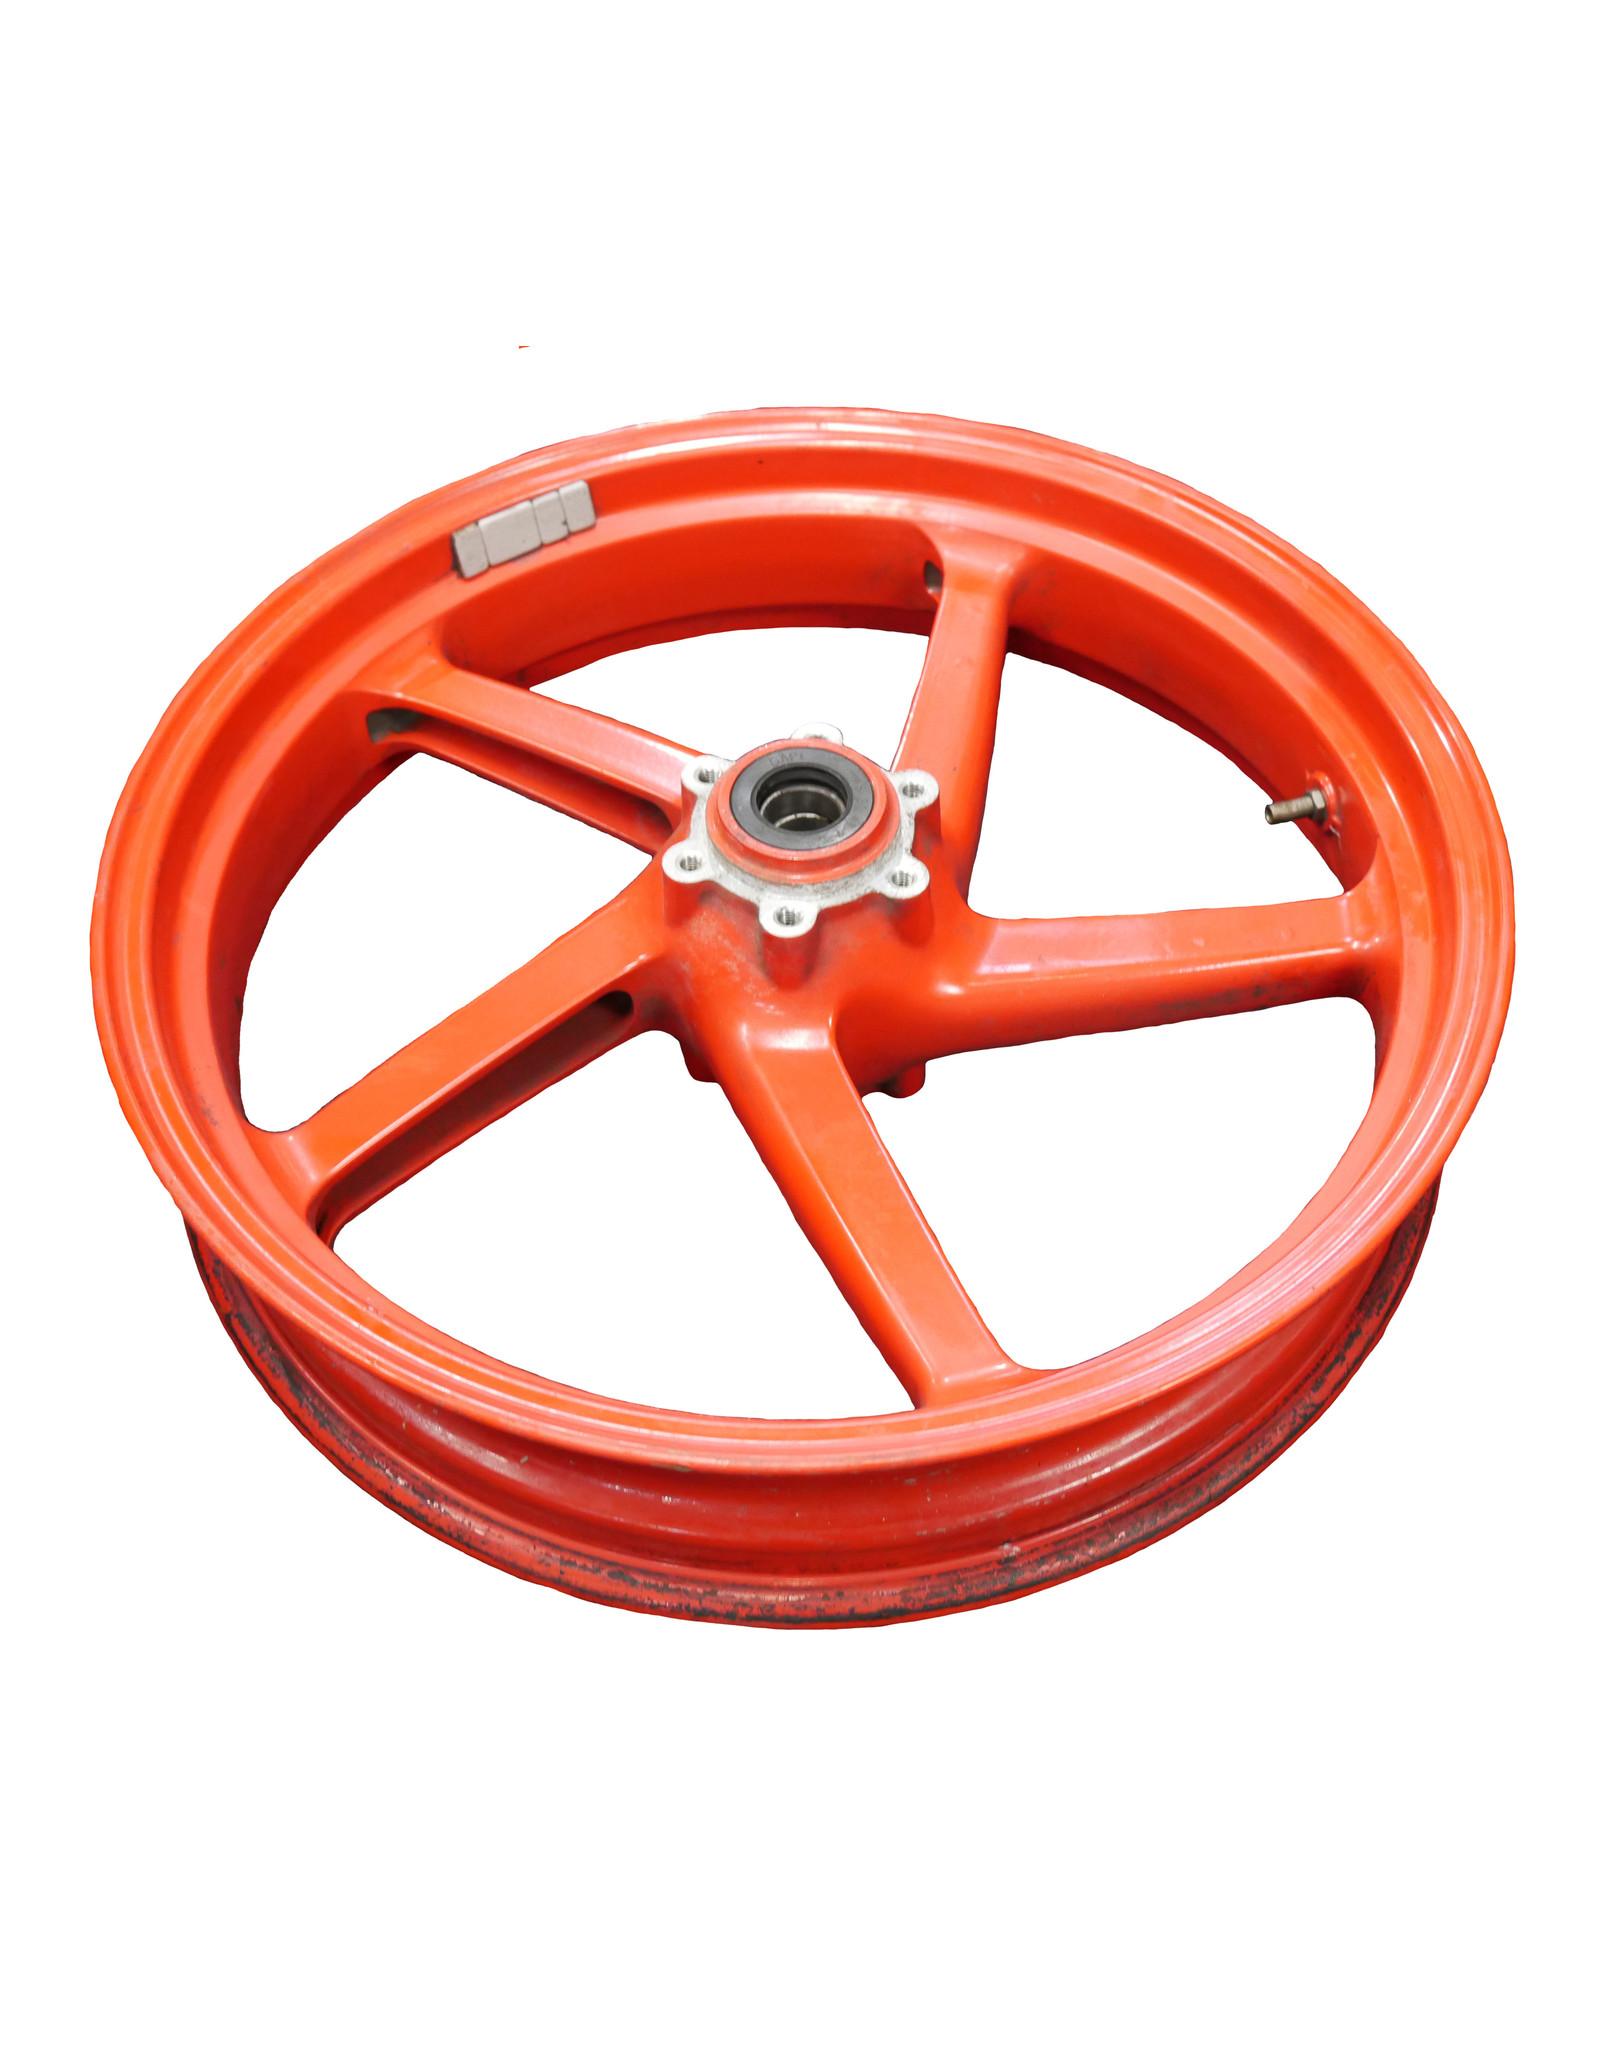 Aprilia Gen 1 RSV/Tuono , Gen 2 04 RSVR Wheels